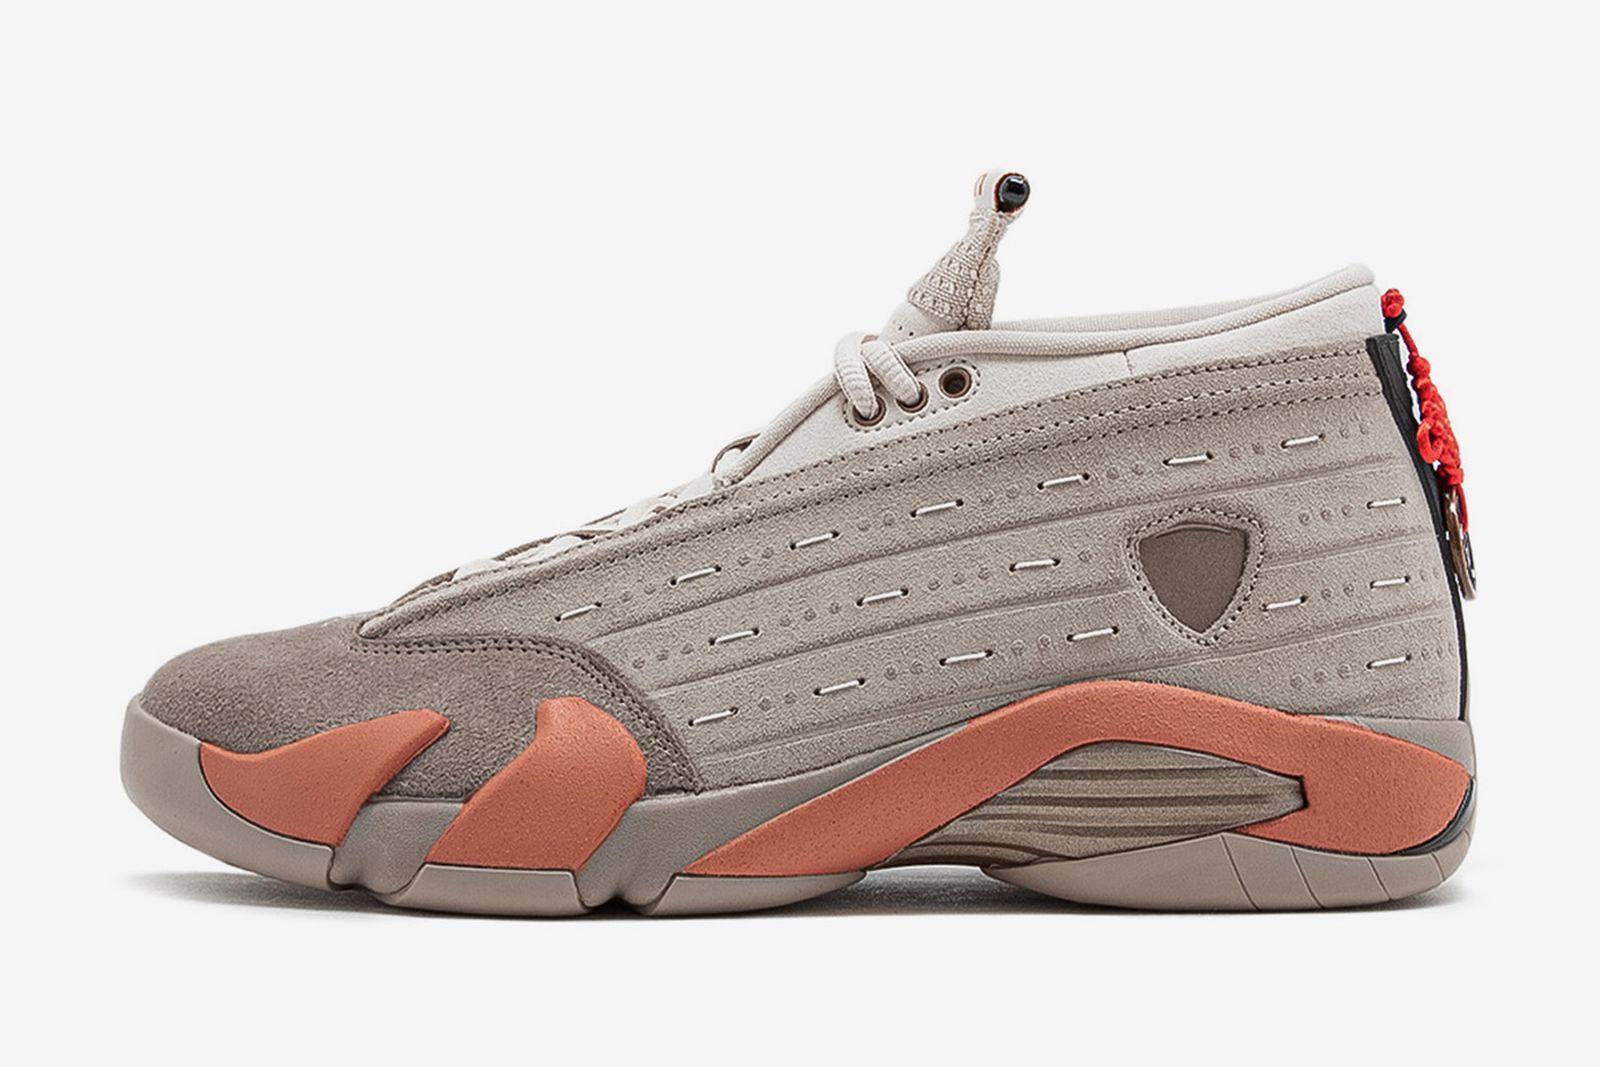 clot-air-jordan-14-low-terracotta-release-info-1-01